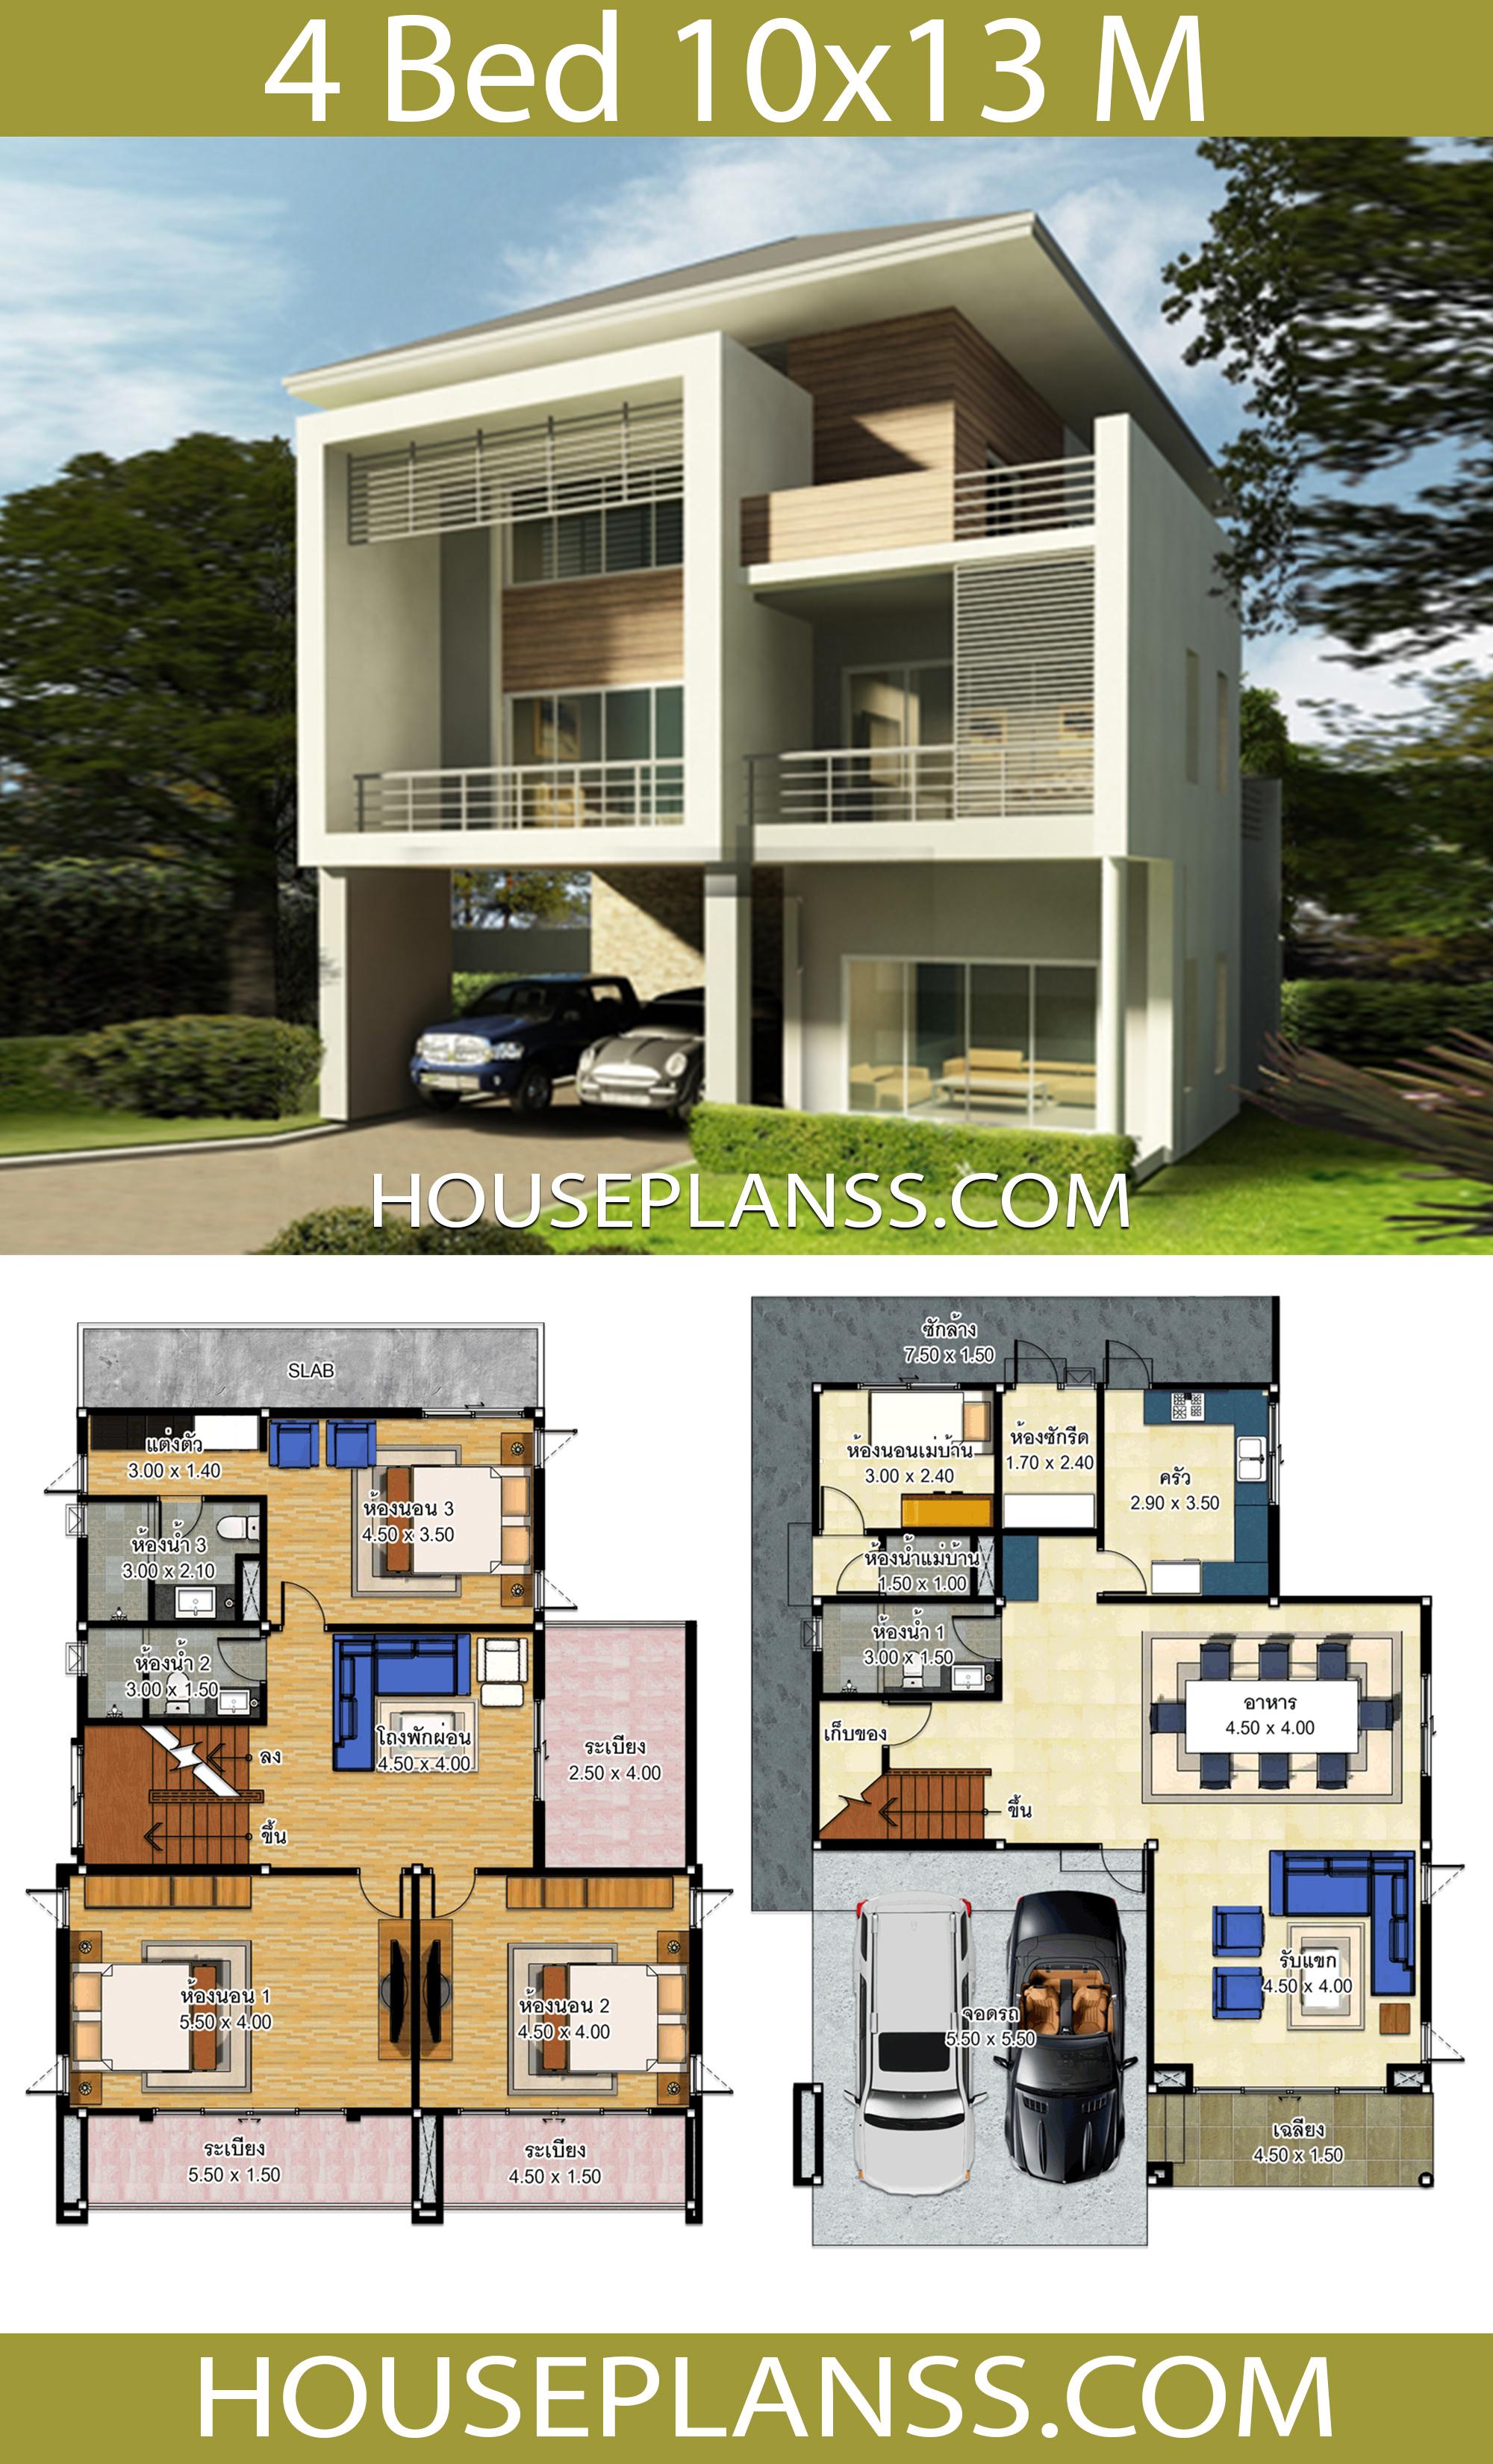 House Design Idea 10x13 With 4 Bedrooms House Plans 3d